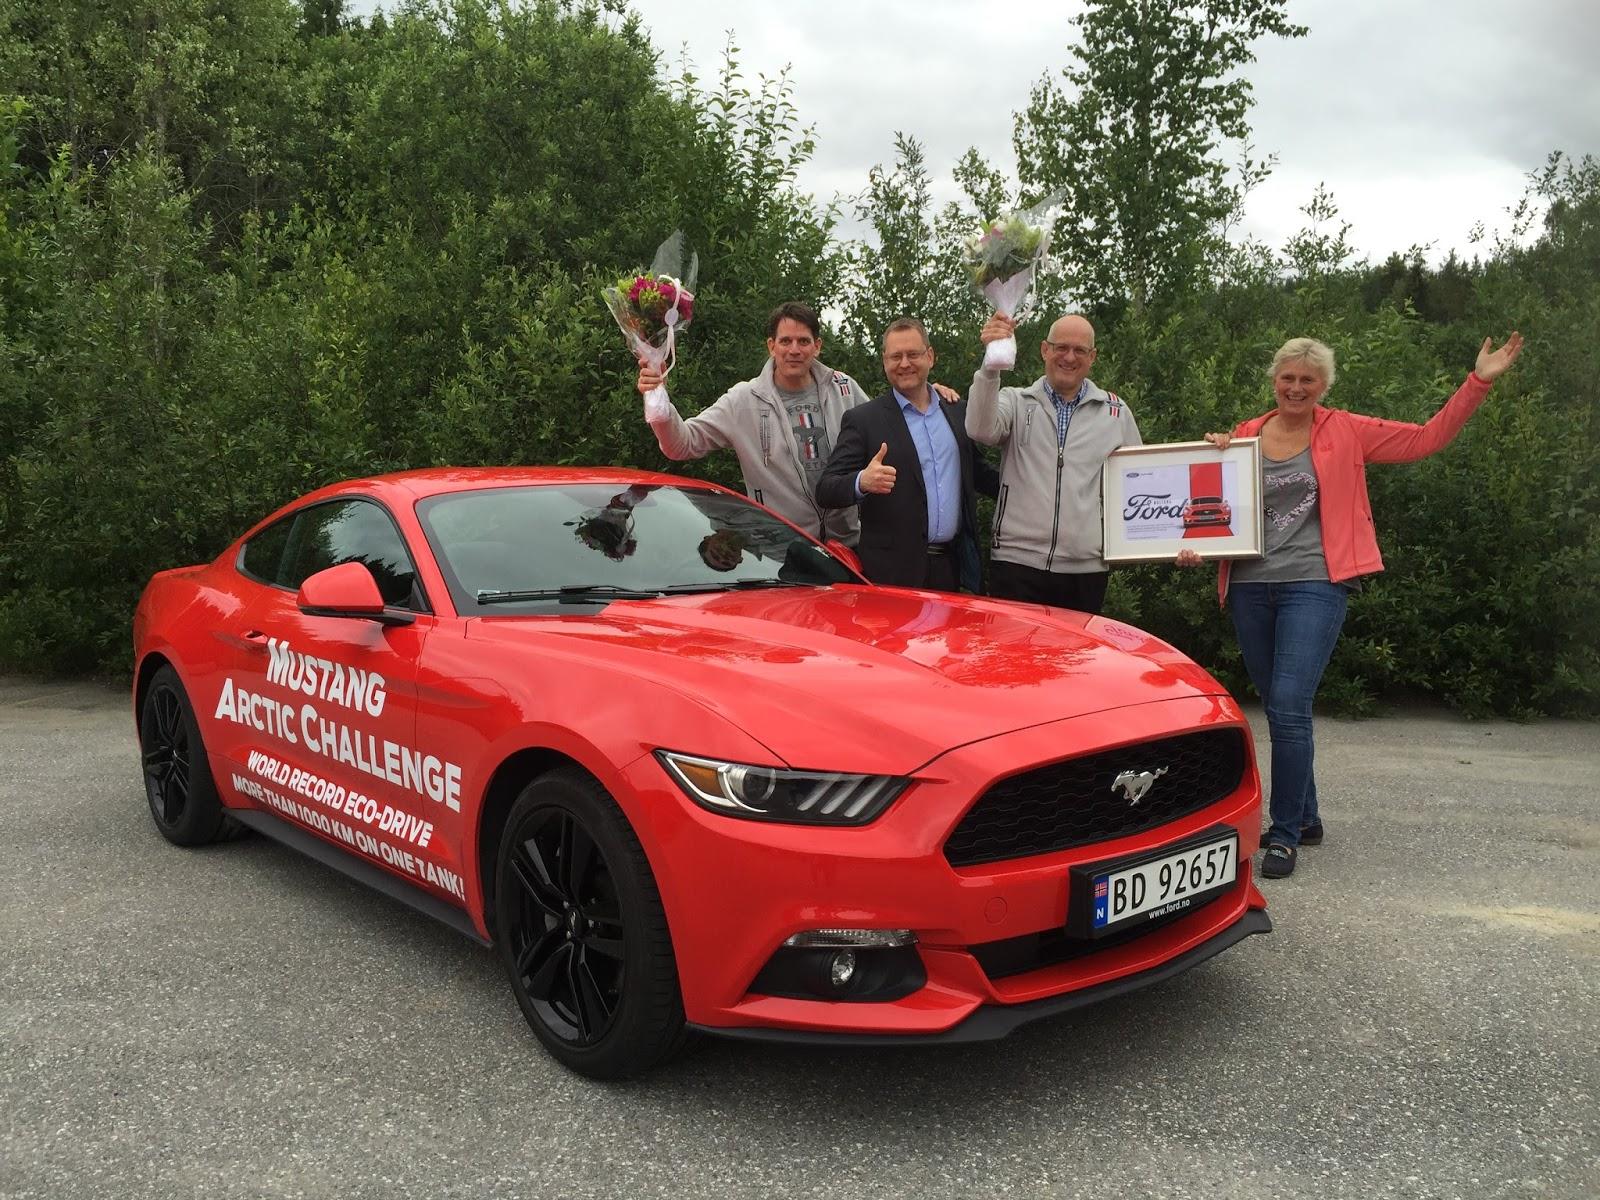 IMG 34092B252842529 Σούπερ εγκρατής οδηγός μιας Mustang, έκανε 1250 χιλιόμετρα με ένα ρεζερβουάρ! Ford, Ford Mustang, Ρεκόρ